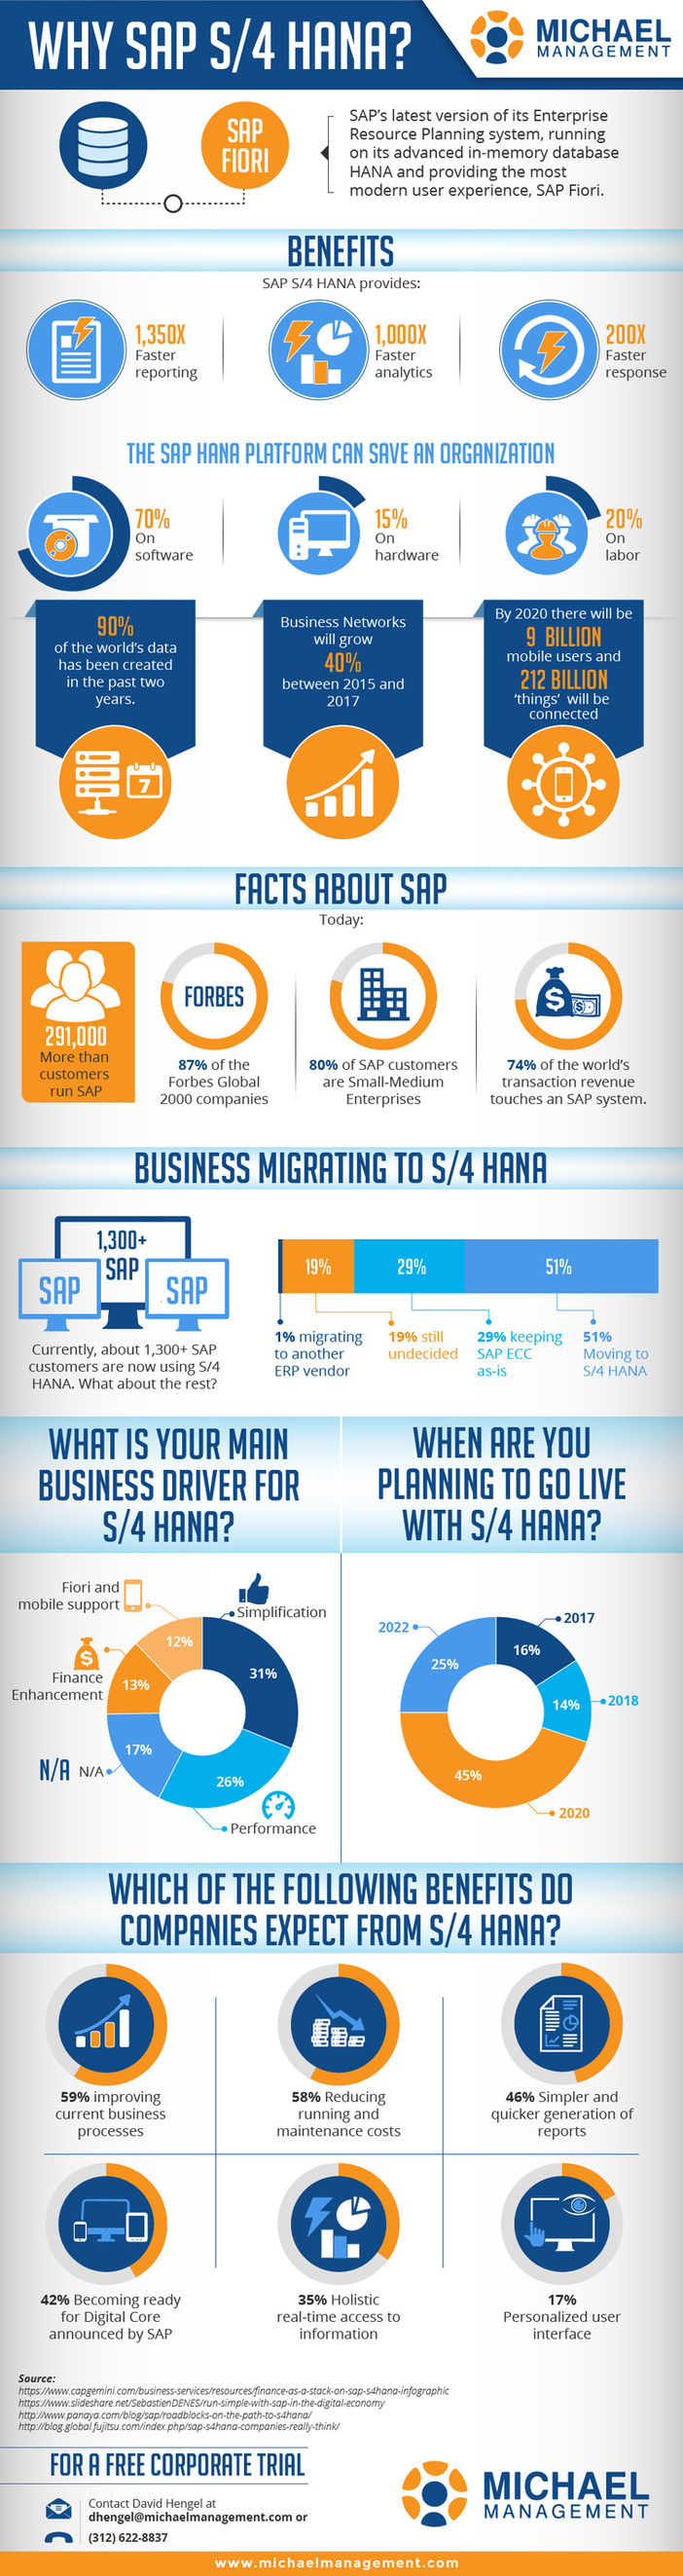 Why SAP A-4 HANA?